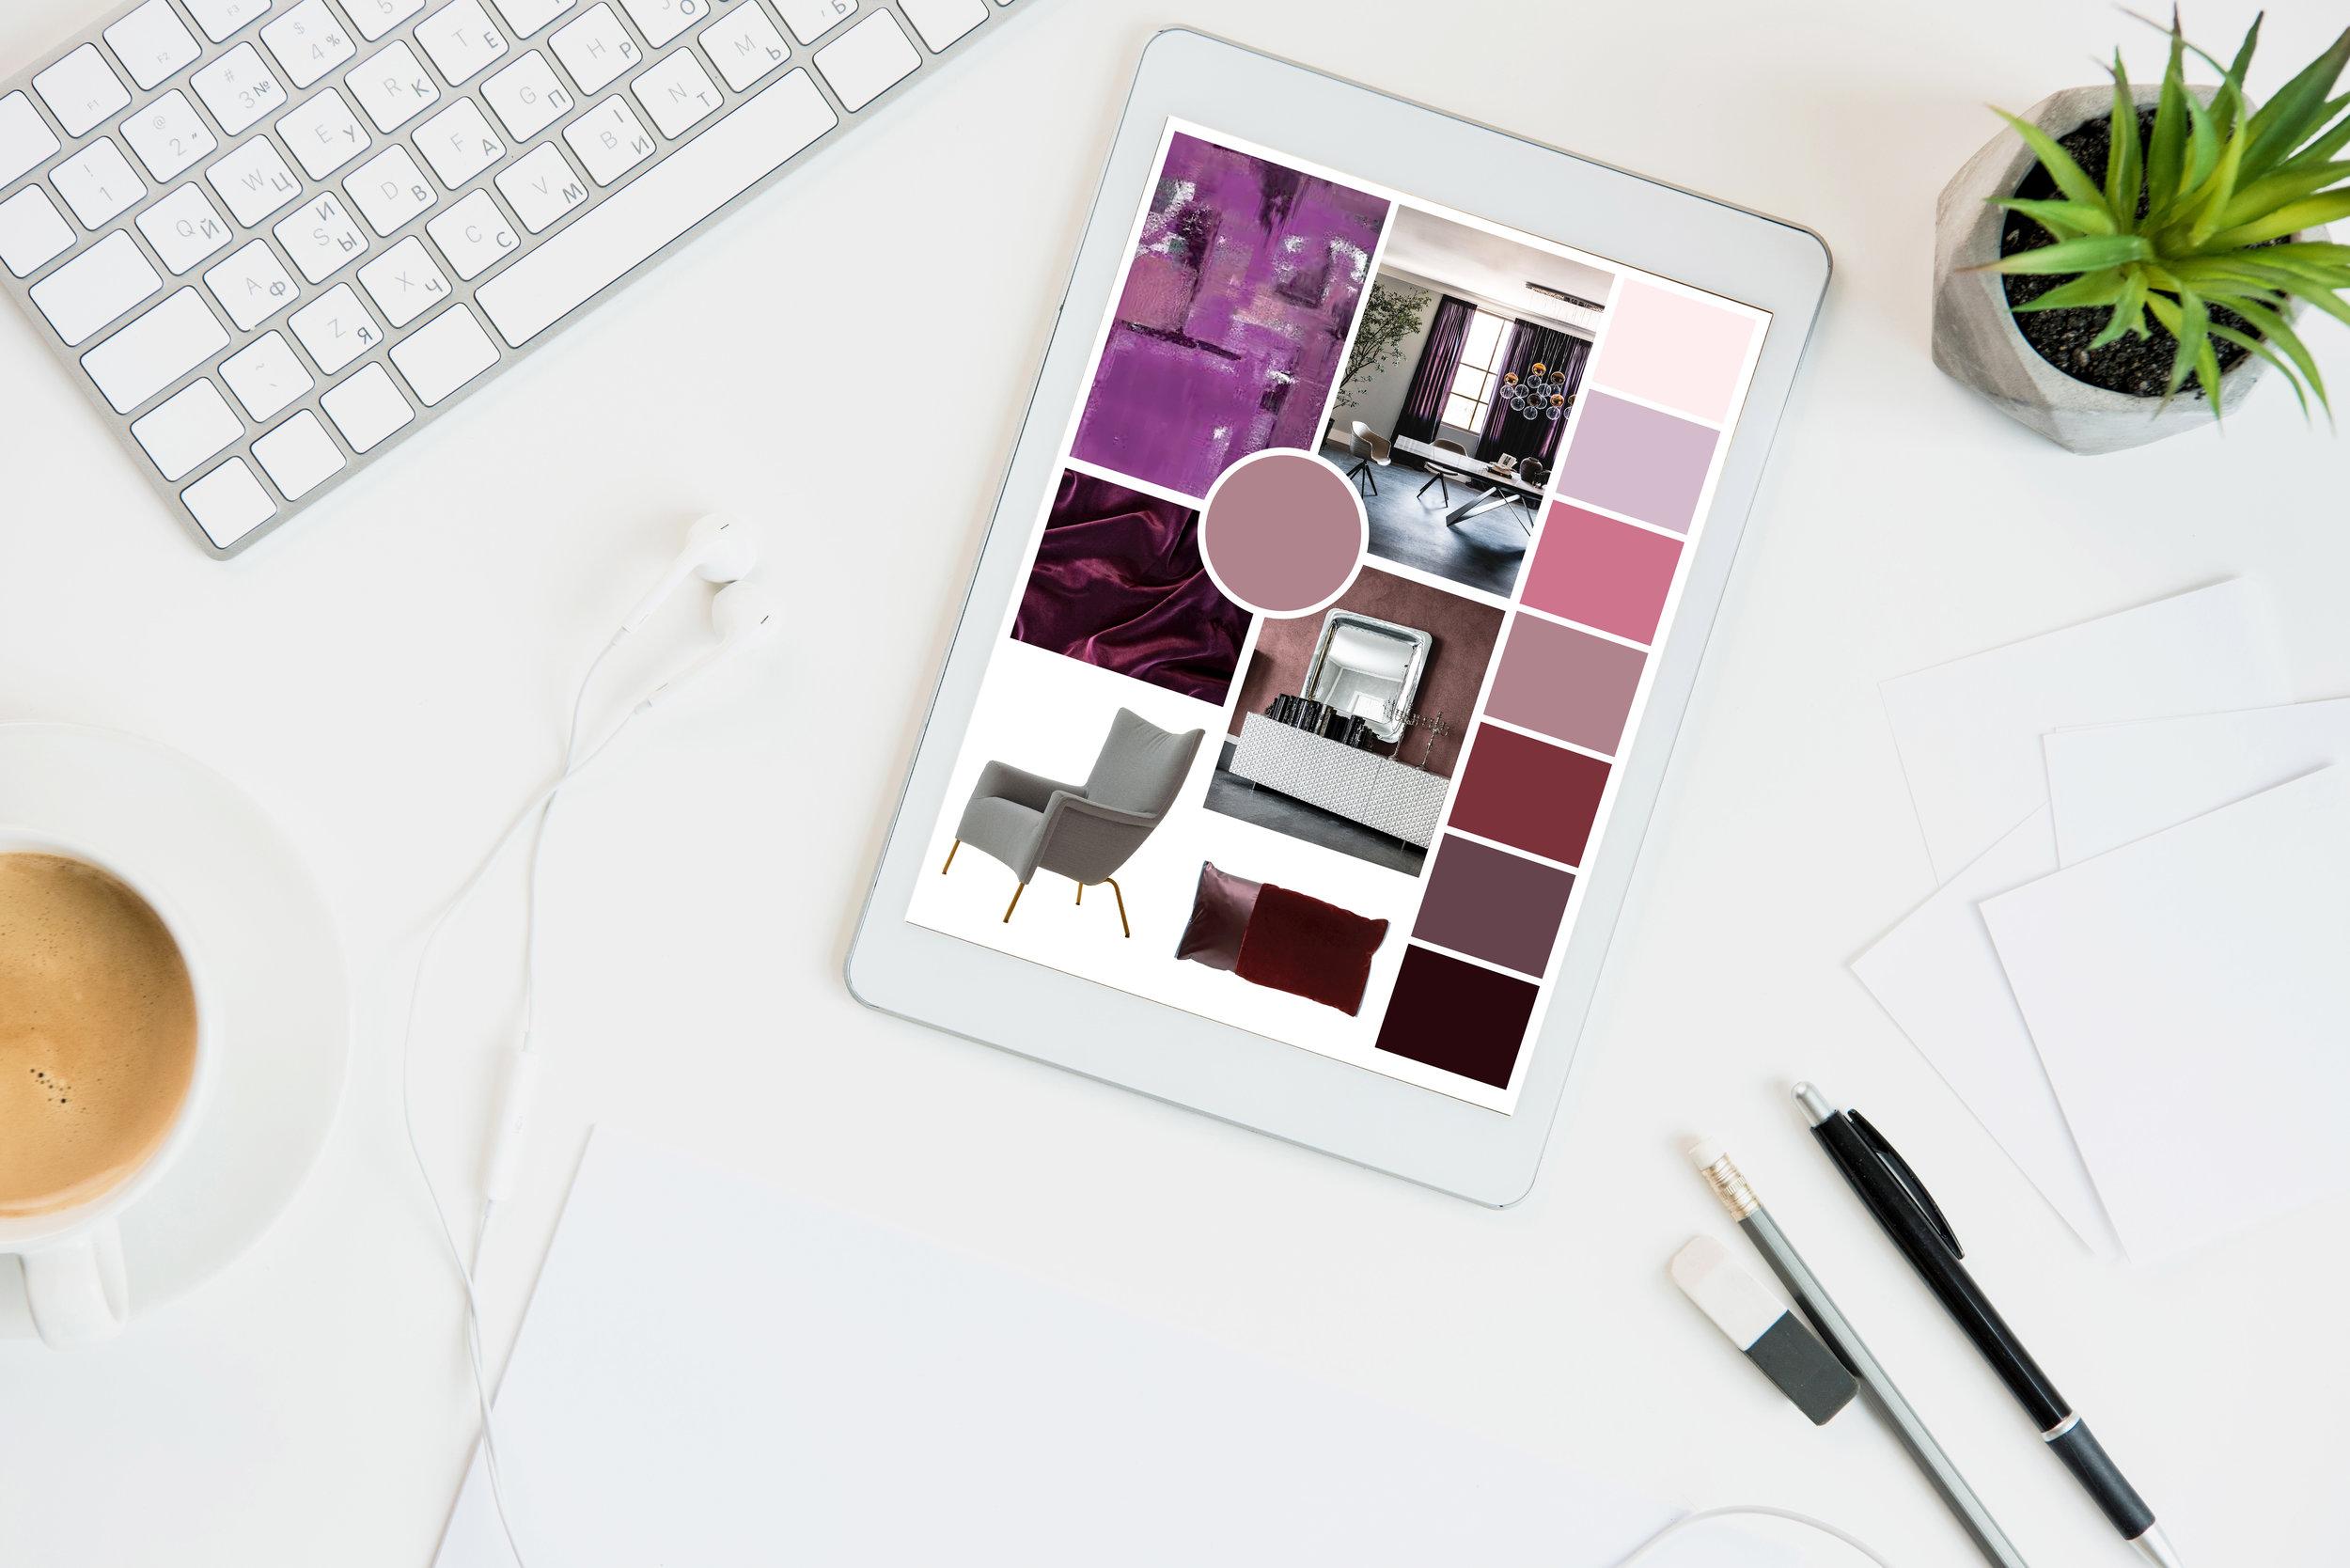 InteriorDesign_MoodBoard_Mockup4.jpg